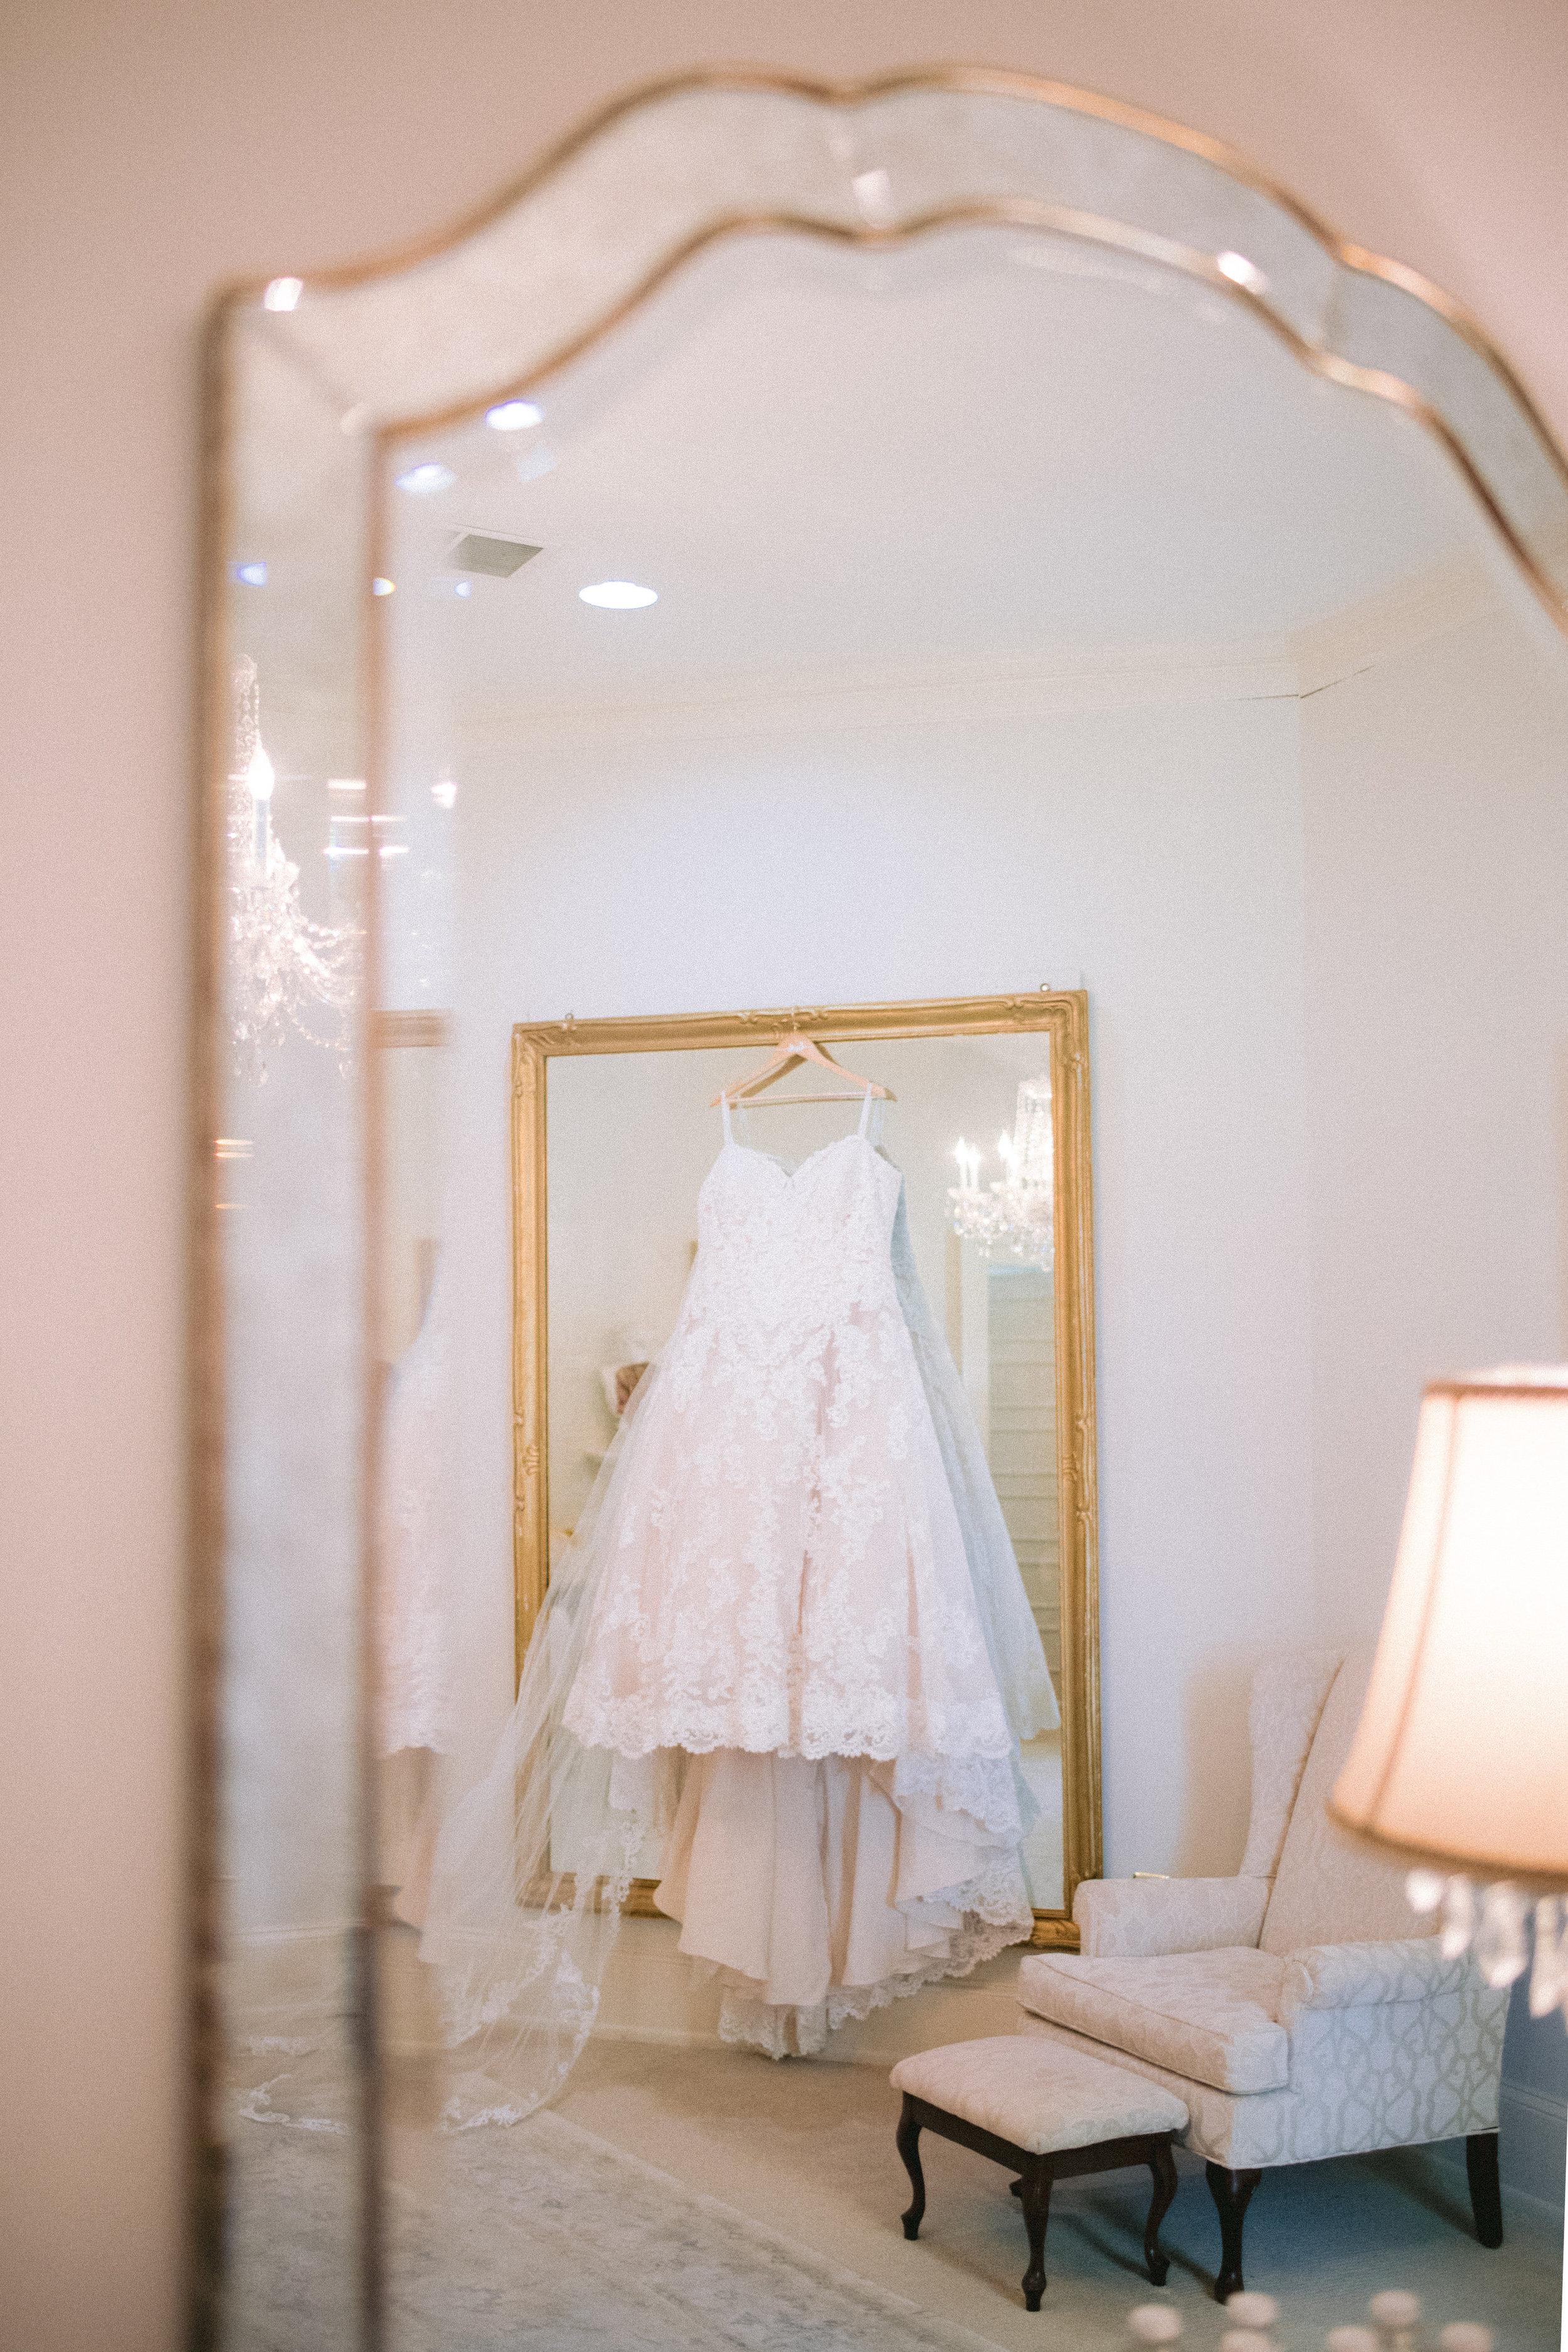 Atlanta wedding dress. Photo by Laura Stone Photography.